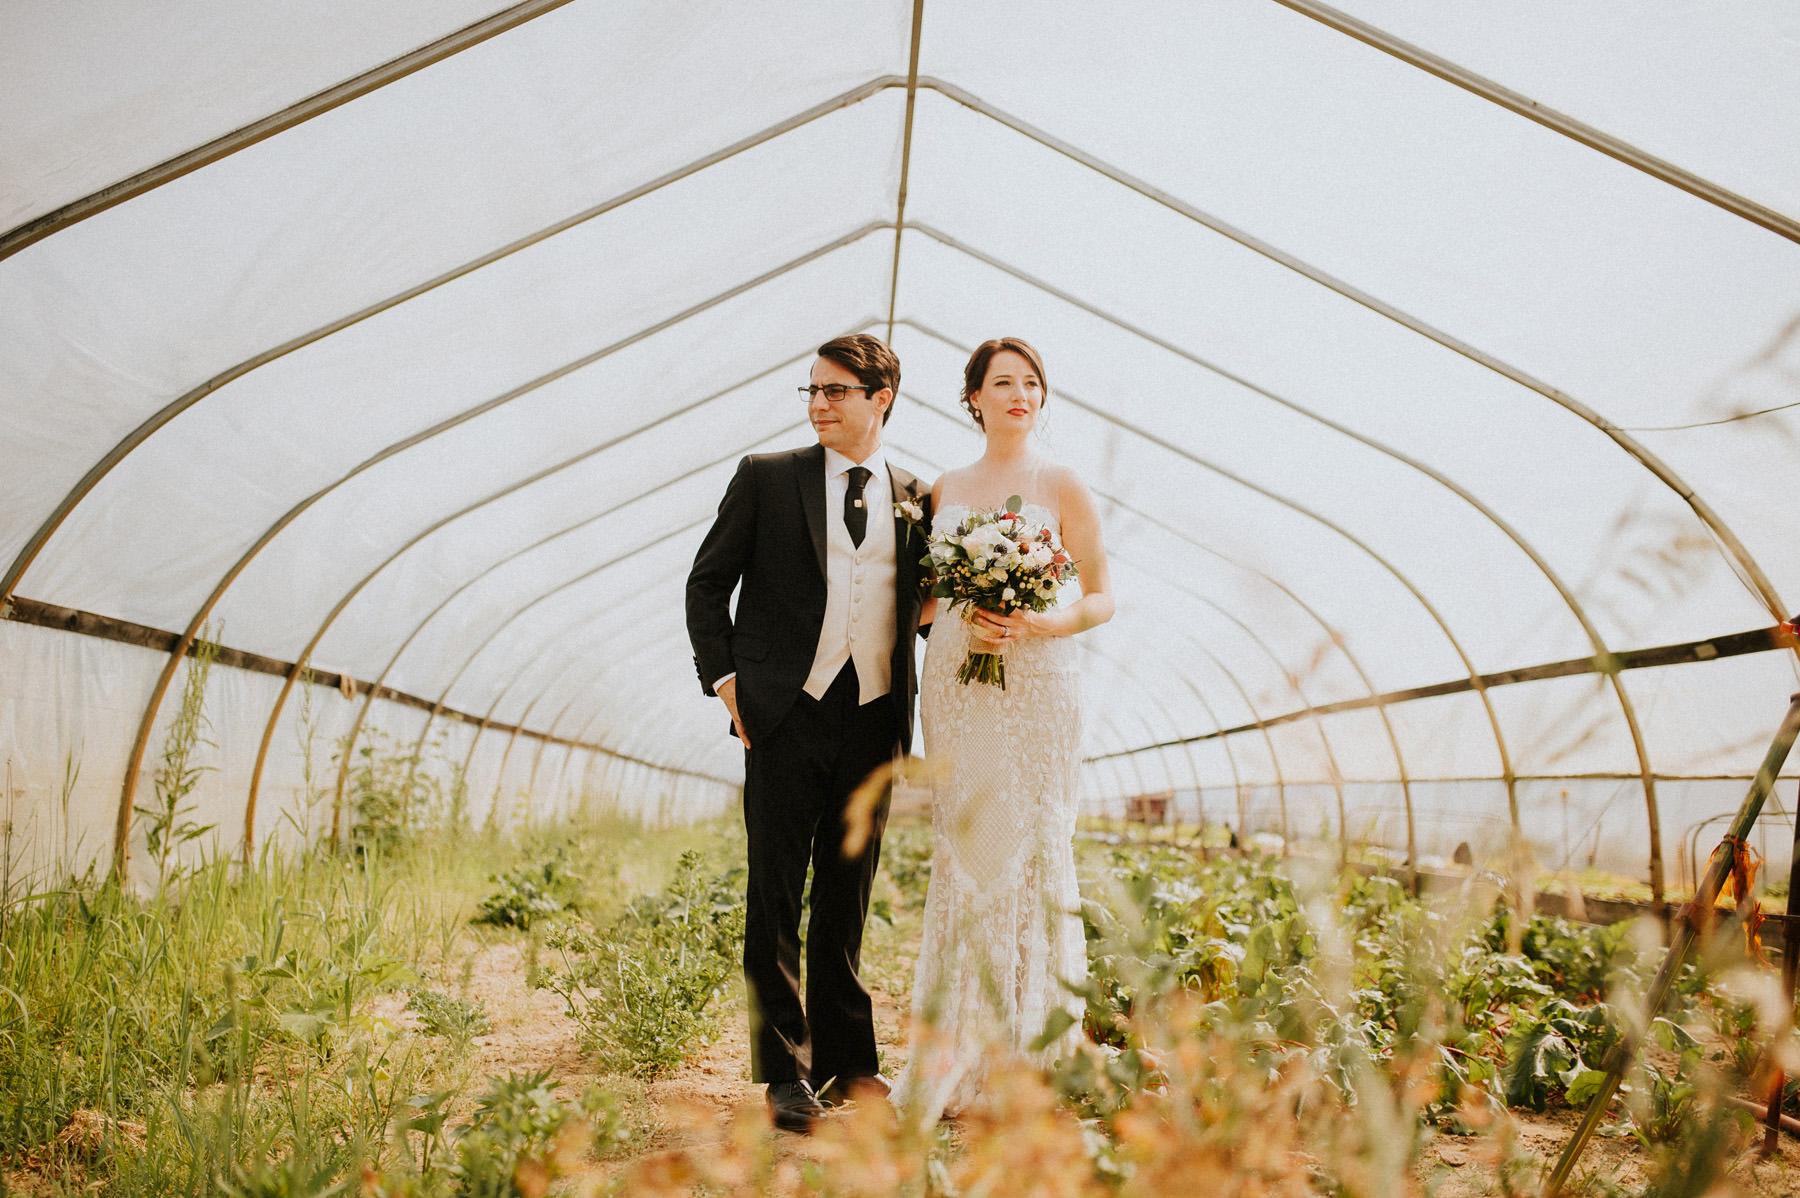 234-inn-at-fernbrook-farms-wedding-11.jpg